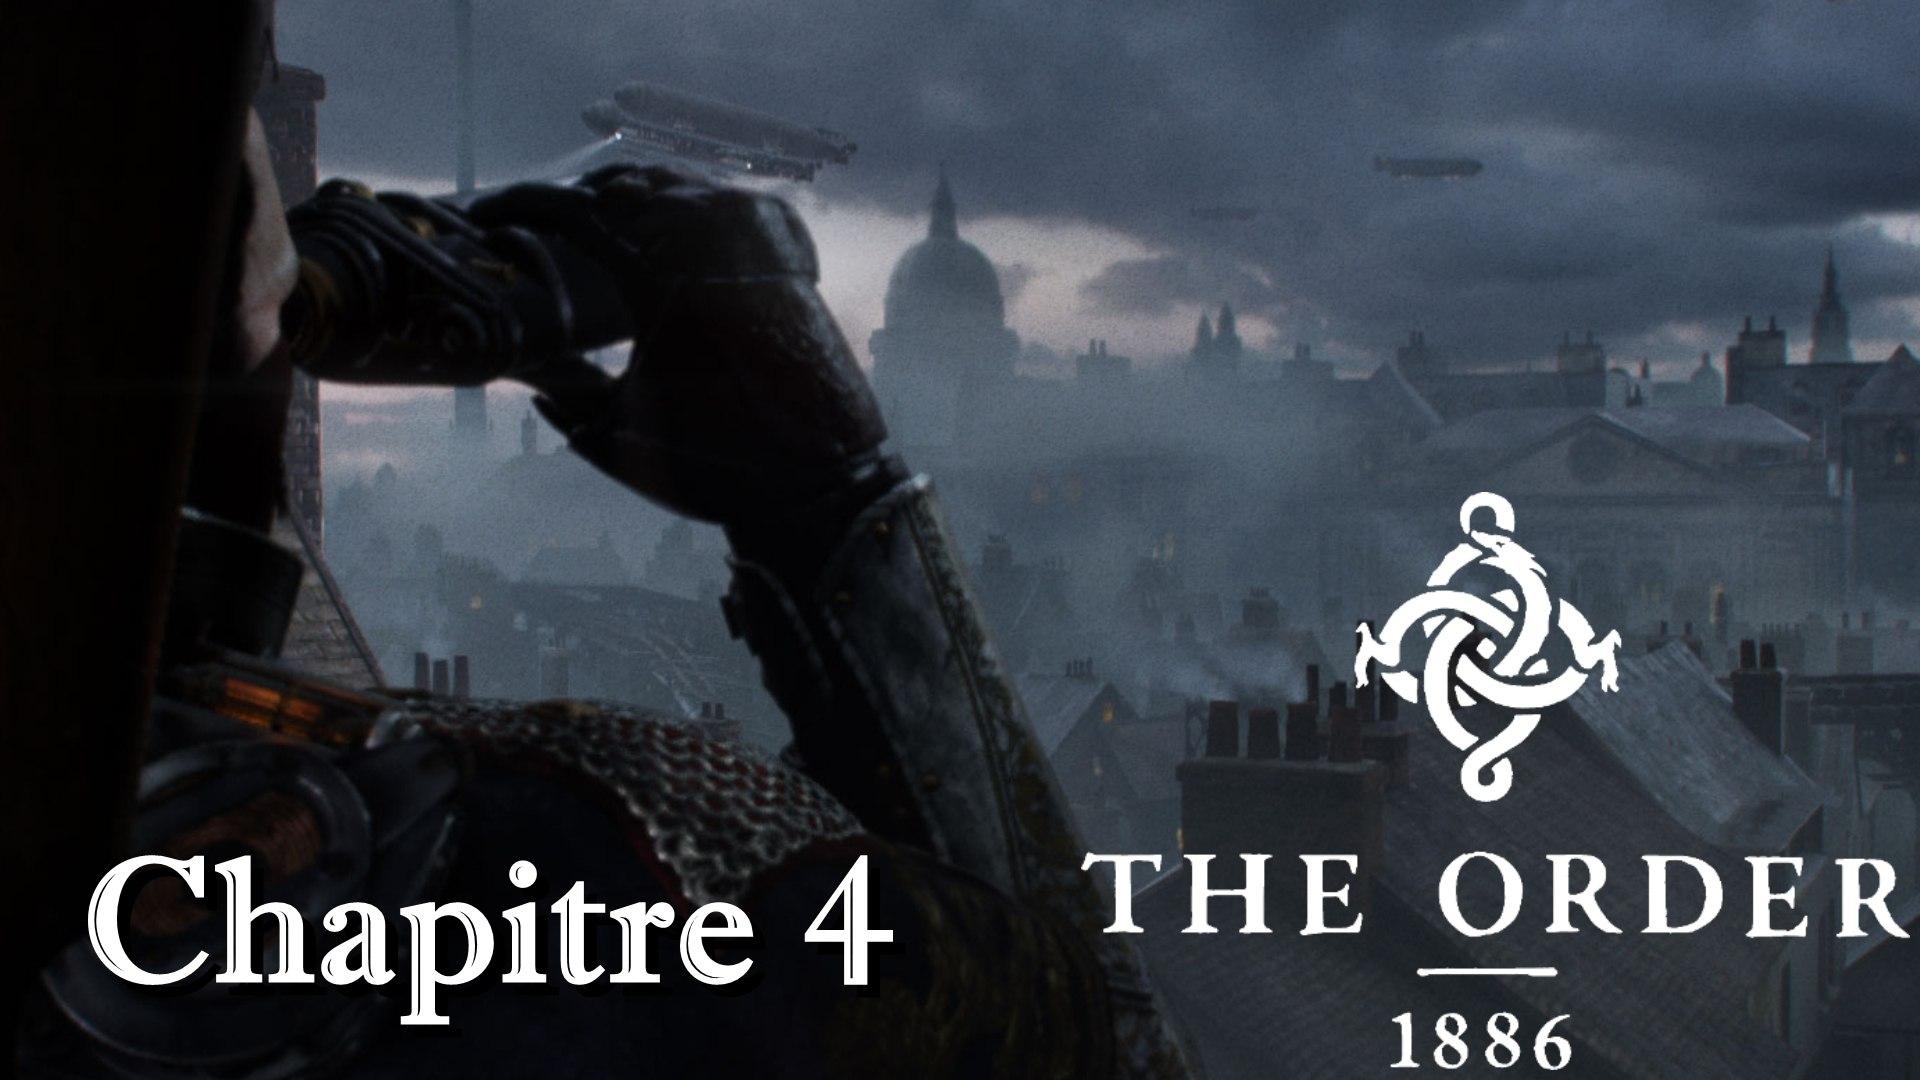 The Order 1886 Gameplay Playstation 4 2015 Chapitre 4 _ Un Combat Sans Fin _ (720p)